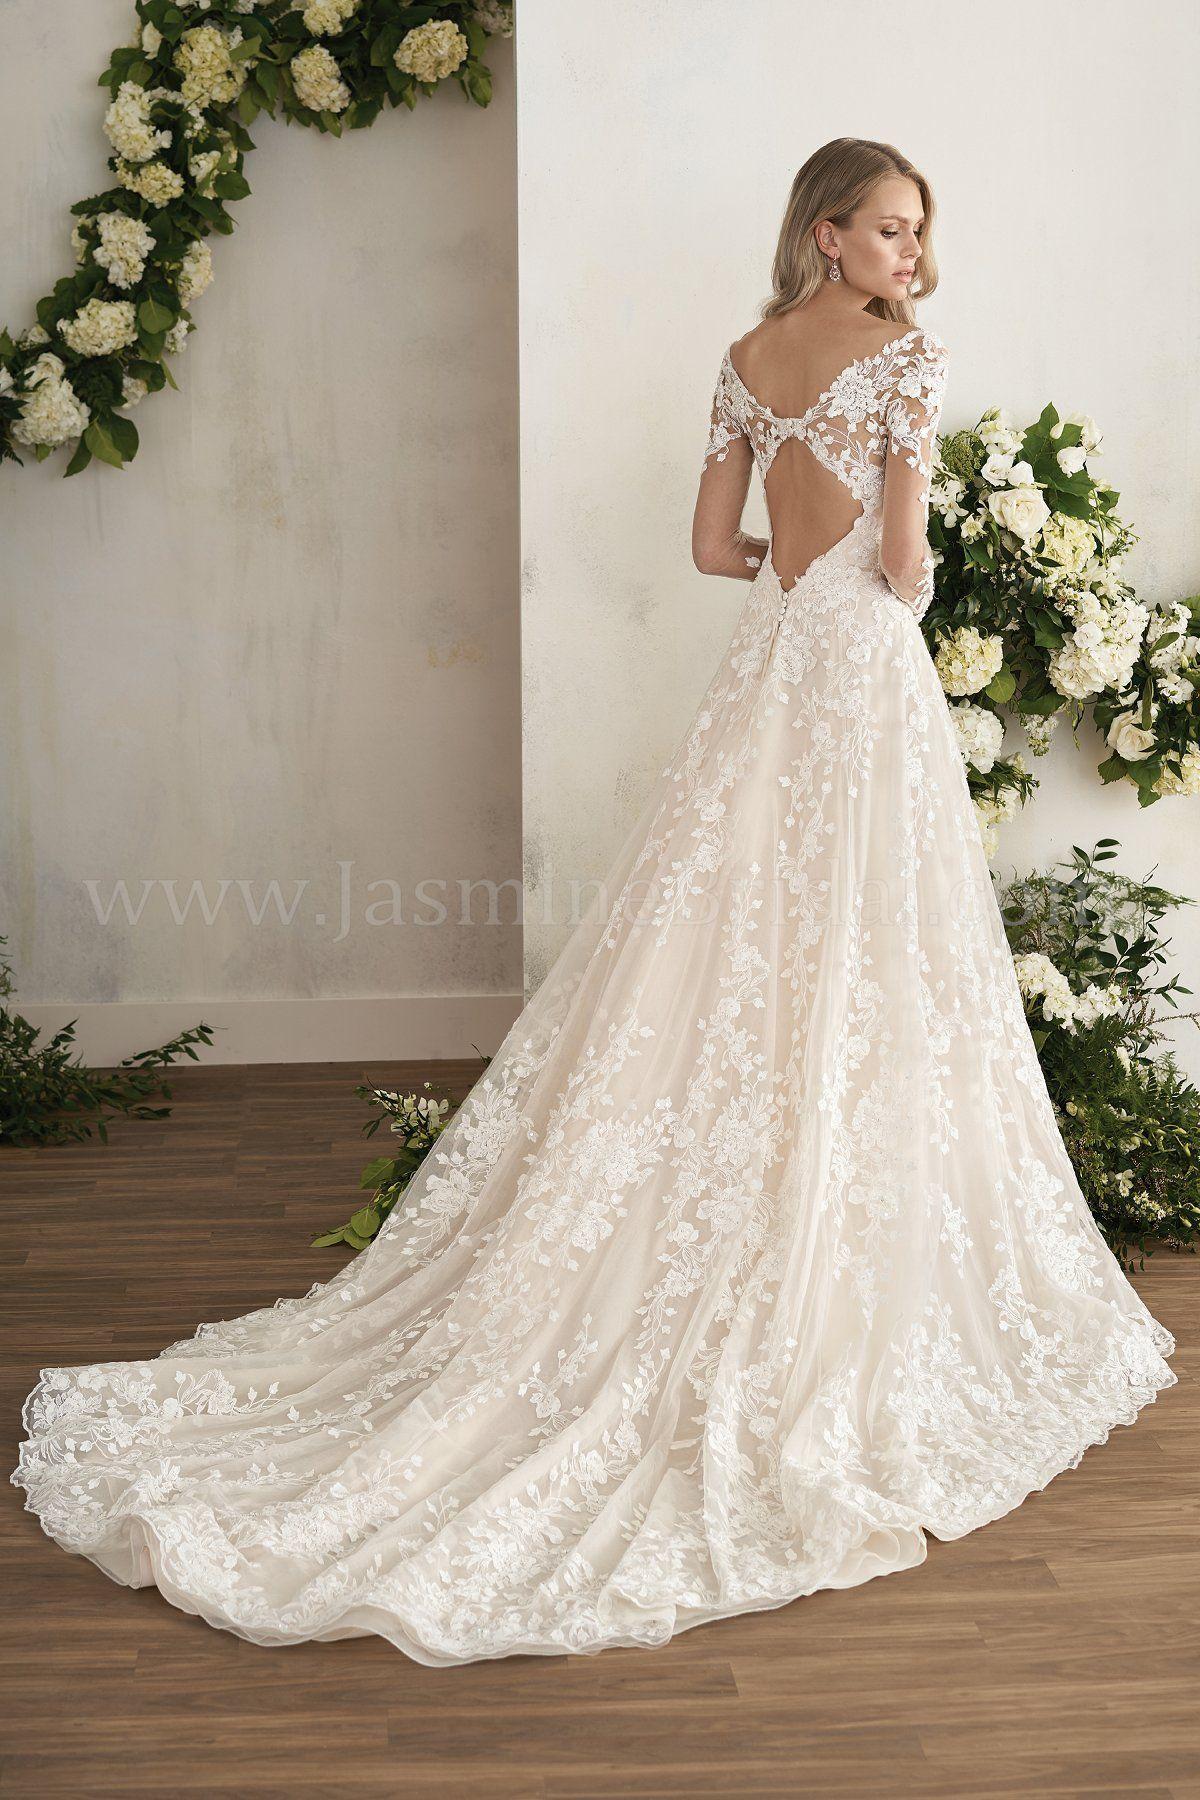 Jasmine Bridal Couture Illusion Sleeves Long Sleeve Wedding